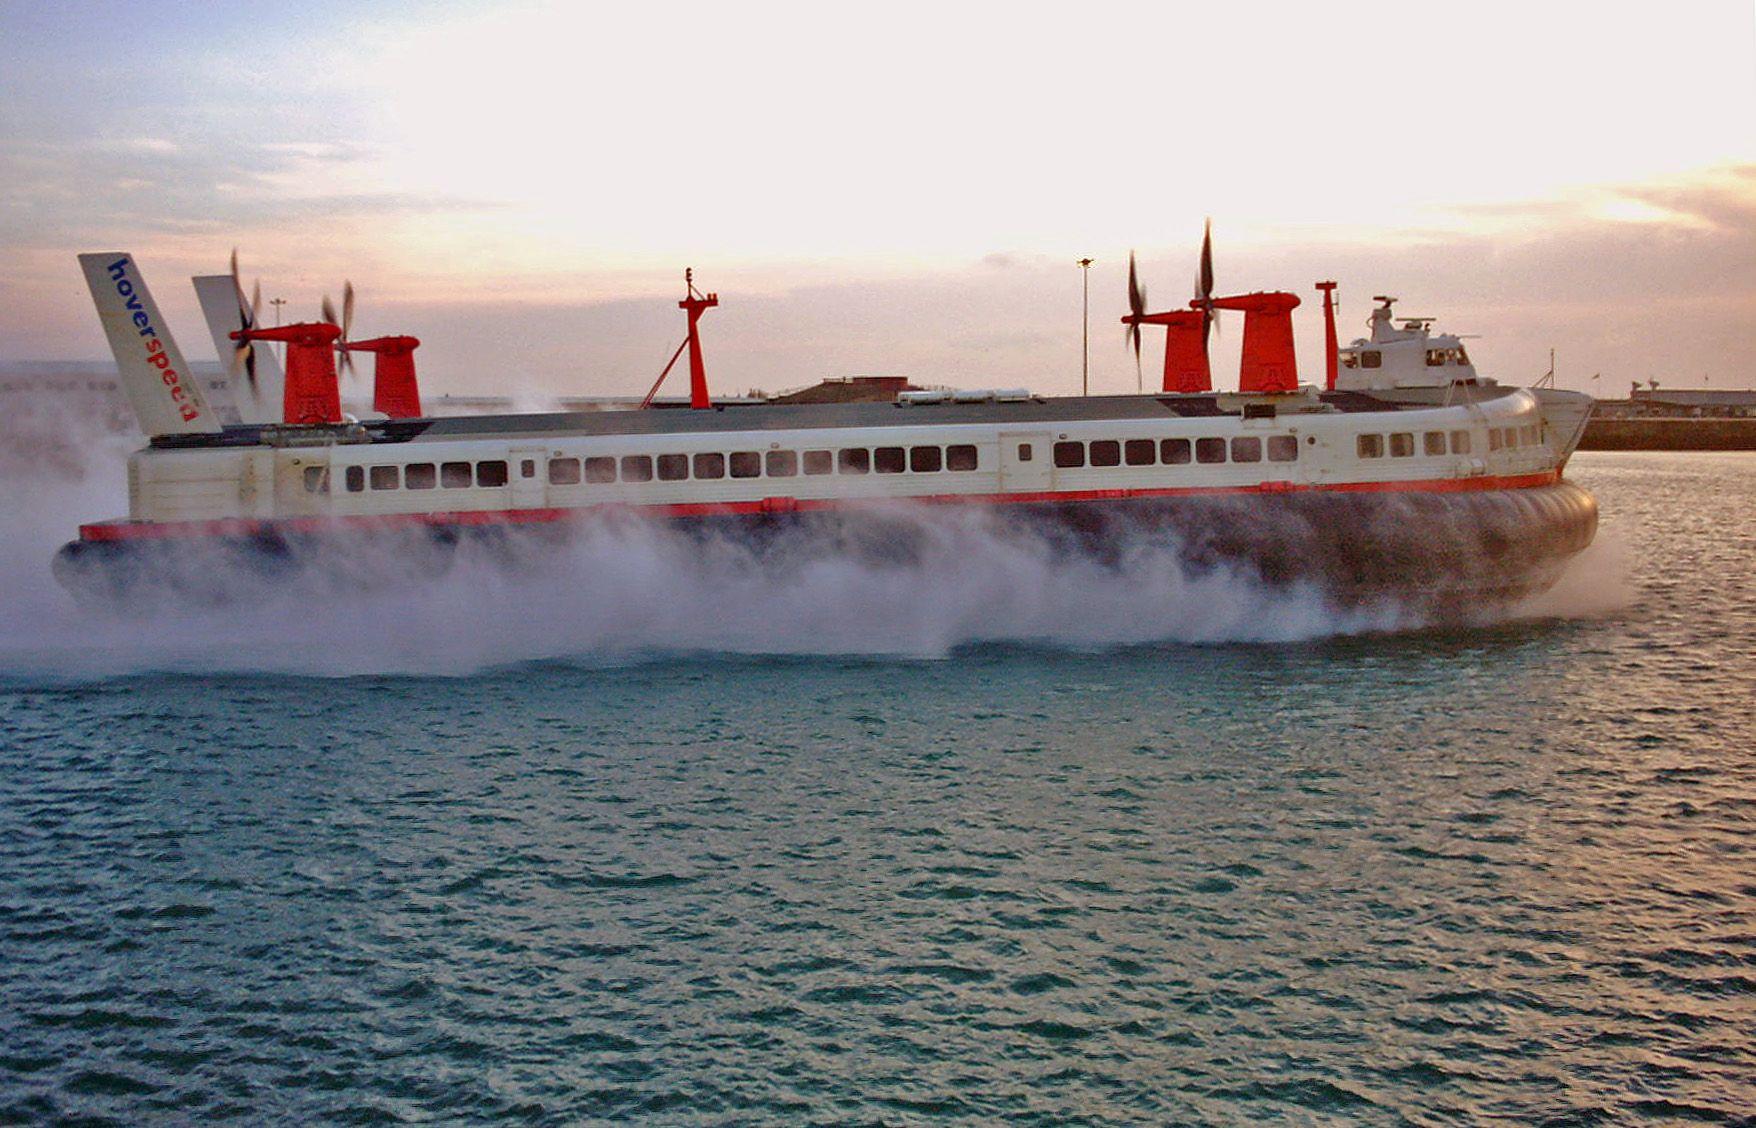 SRN4 Hovercraft Mountbatten Class - Ferry - Wikipedia, the free